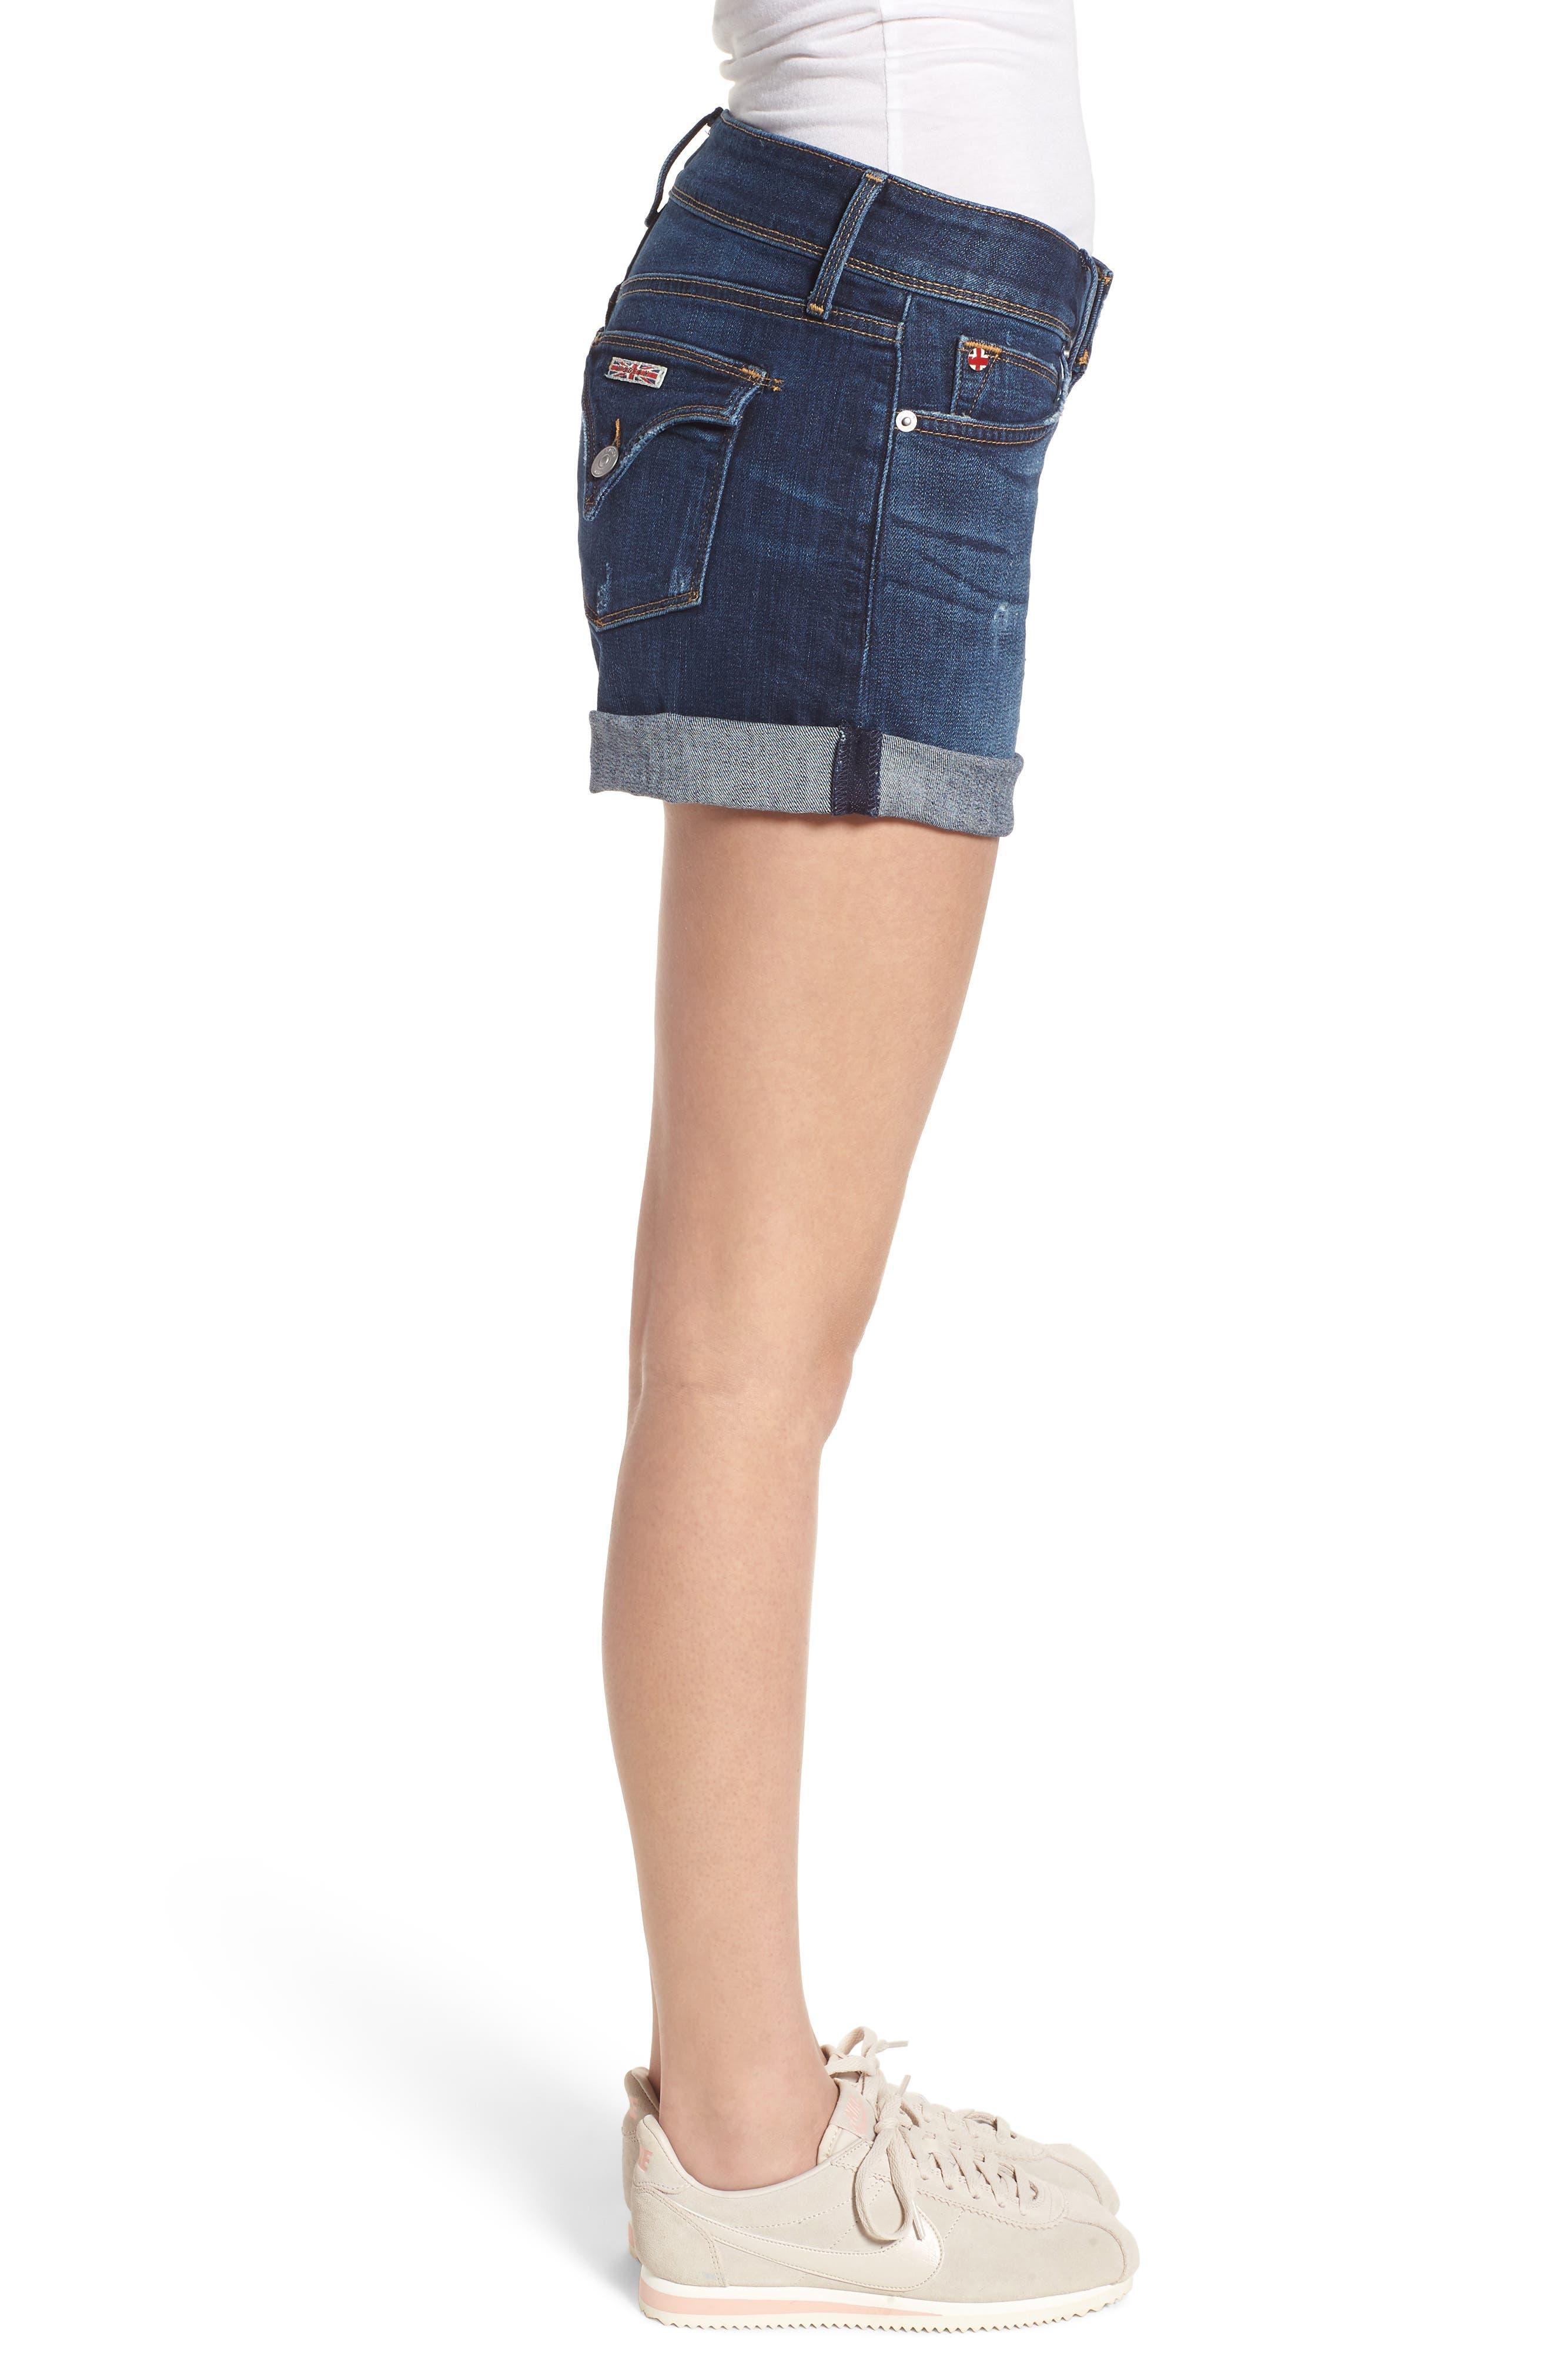 Croxley Cuffed Denim Shorts,                             Alternate thumbnail 3, color,                             423